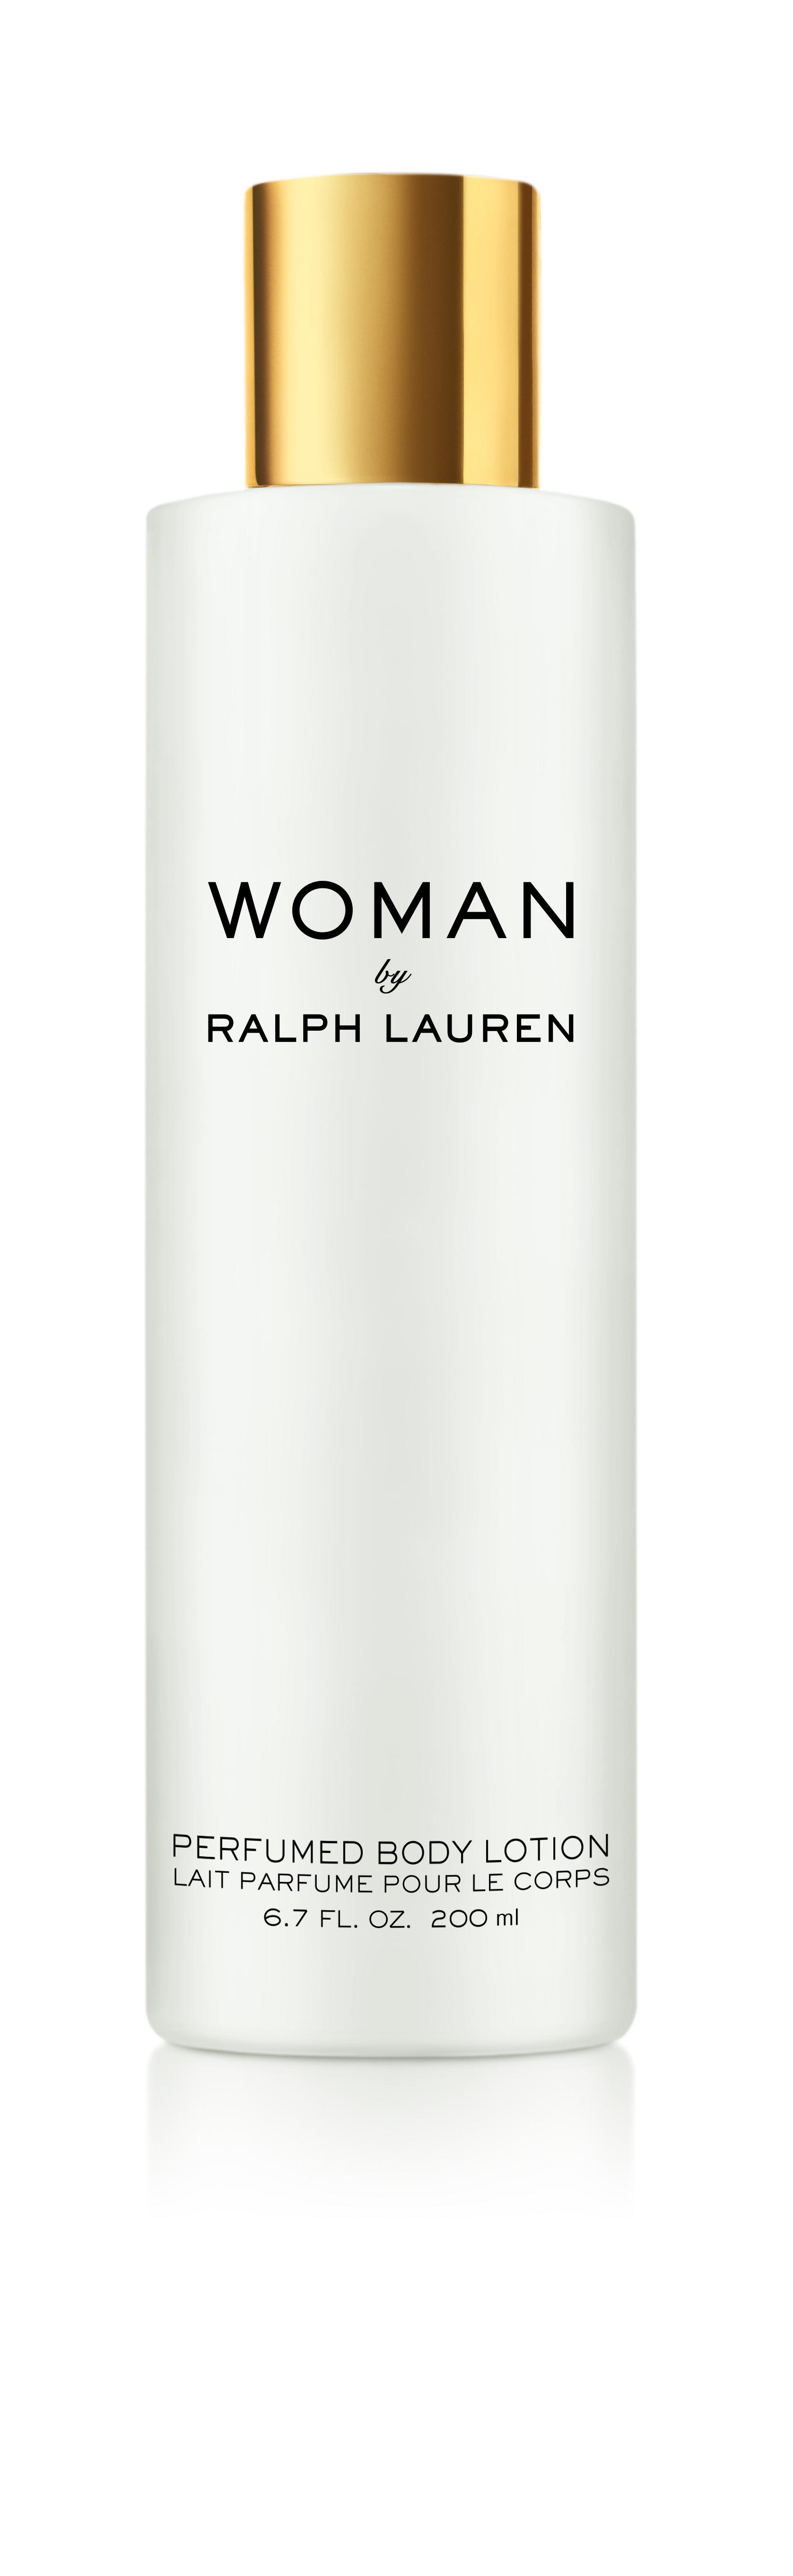 Woman By Ralph Lauren Body Lotion 200ml